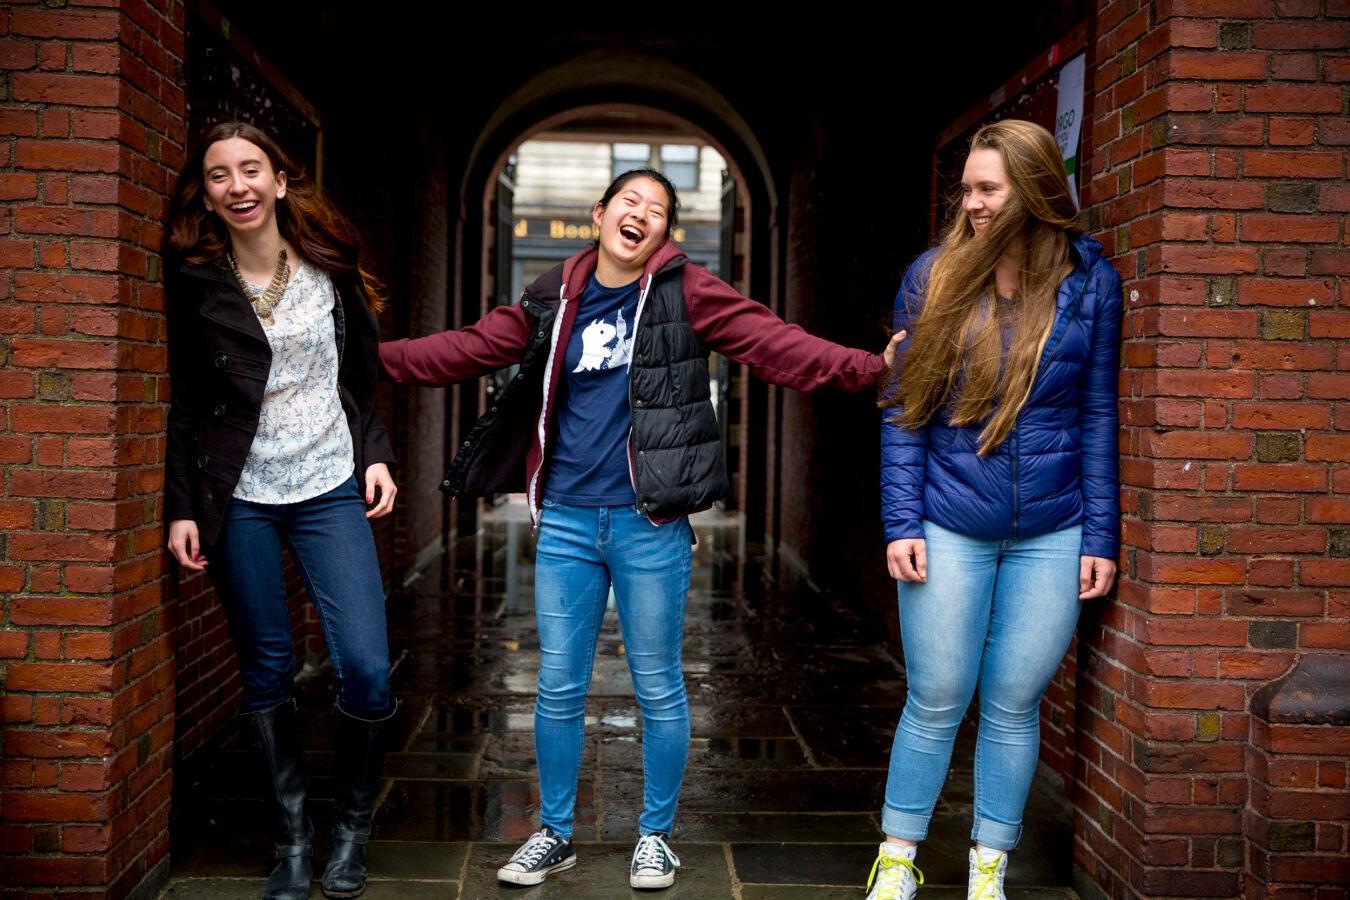 Thayer House freshmen friends, Kristie Colton, '20 of Utah (from left); Georgia Seidel, '20 of Australia, and Rebecca Chen, '20 of California.